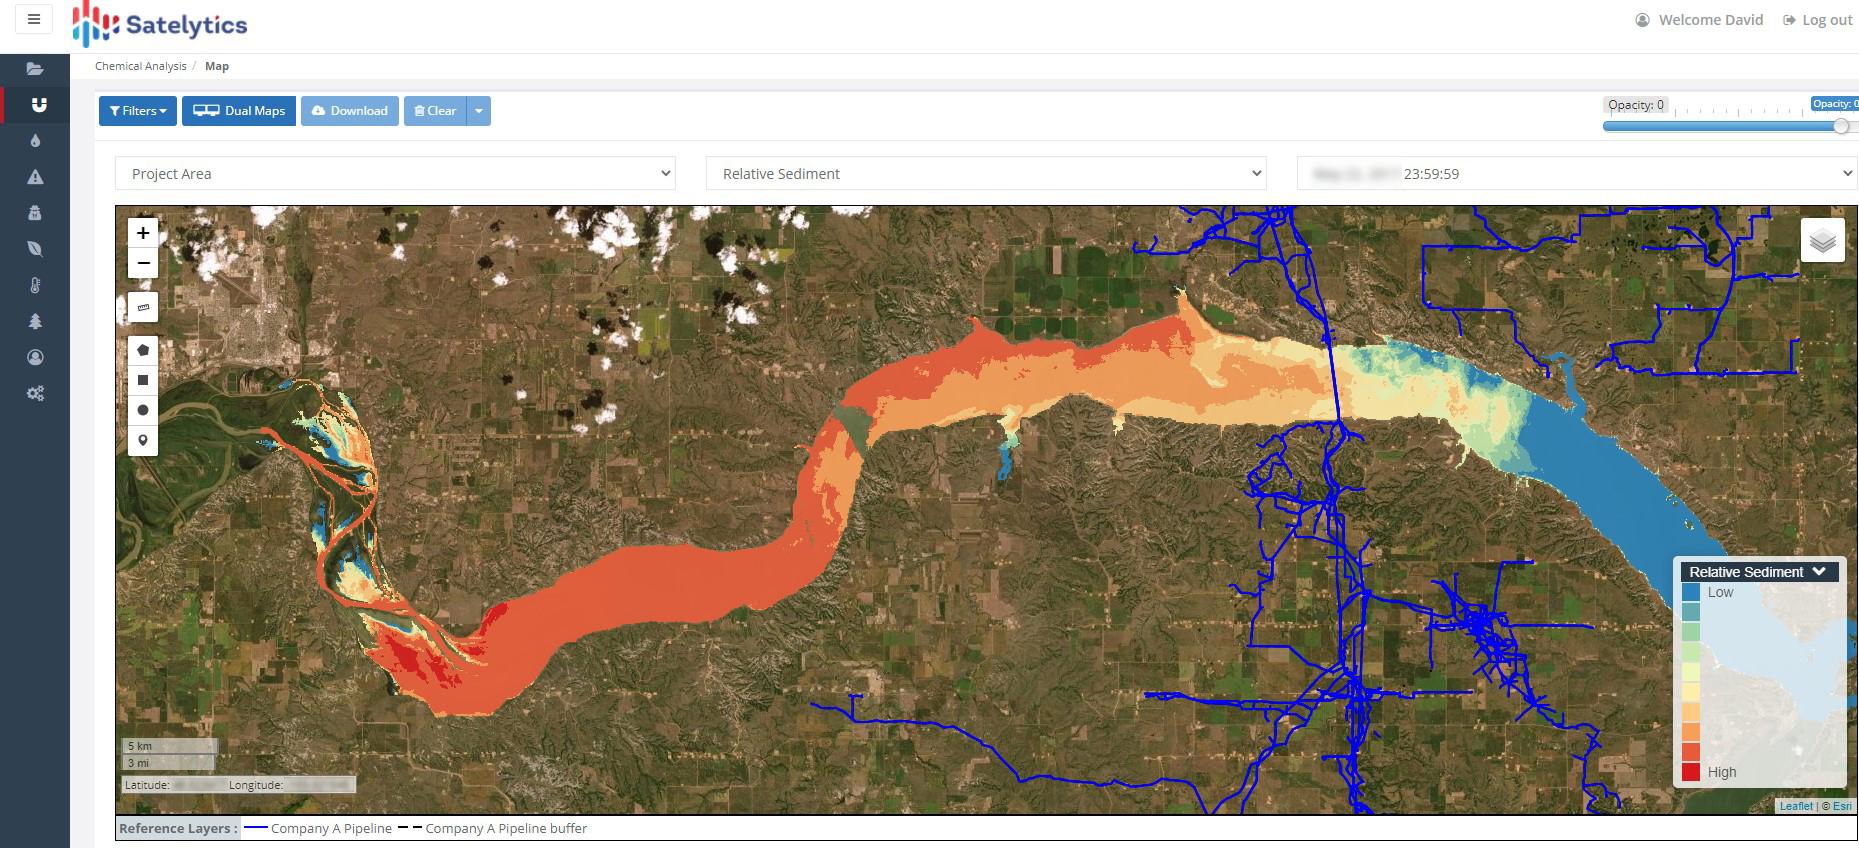 Thousands of pipeline water crossings exist in the U.S.